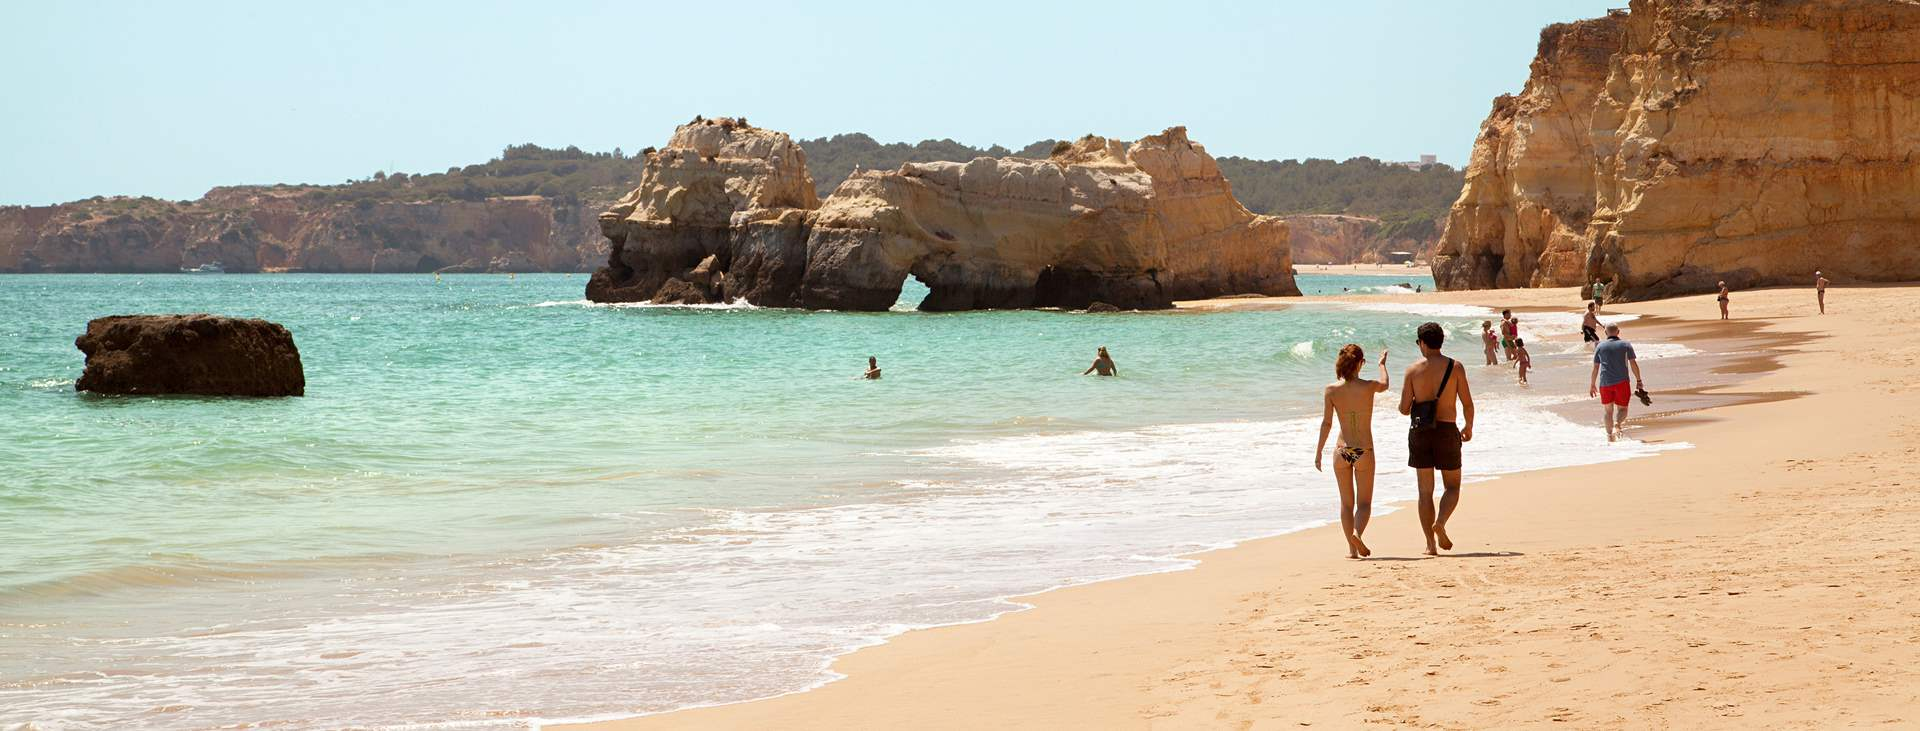 Matkoja myös Praia da Rochaan, Portugaliin